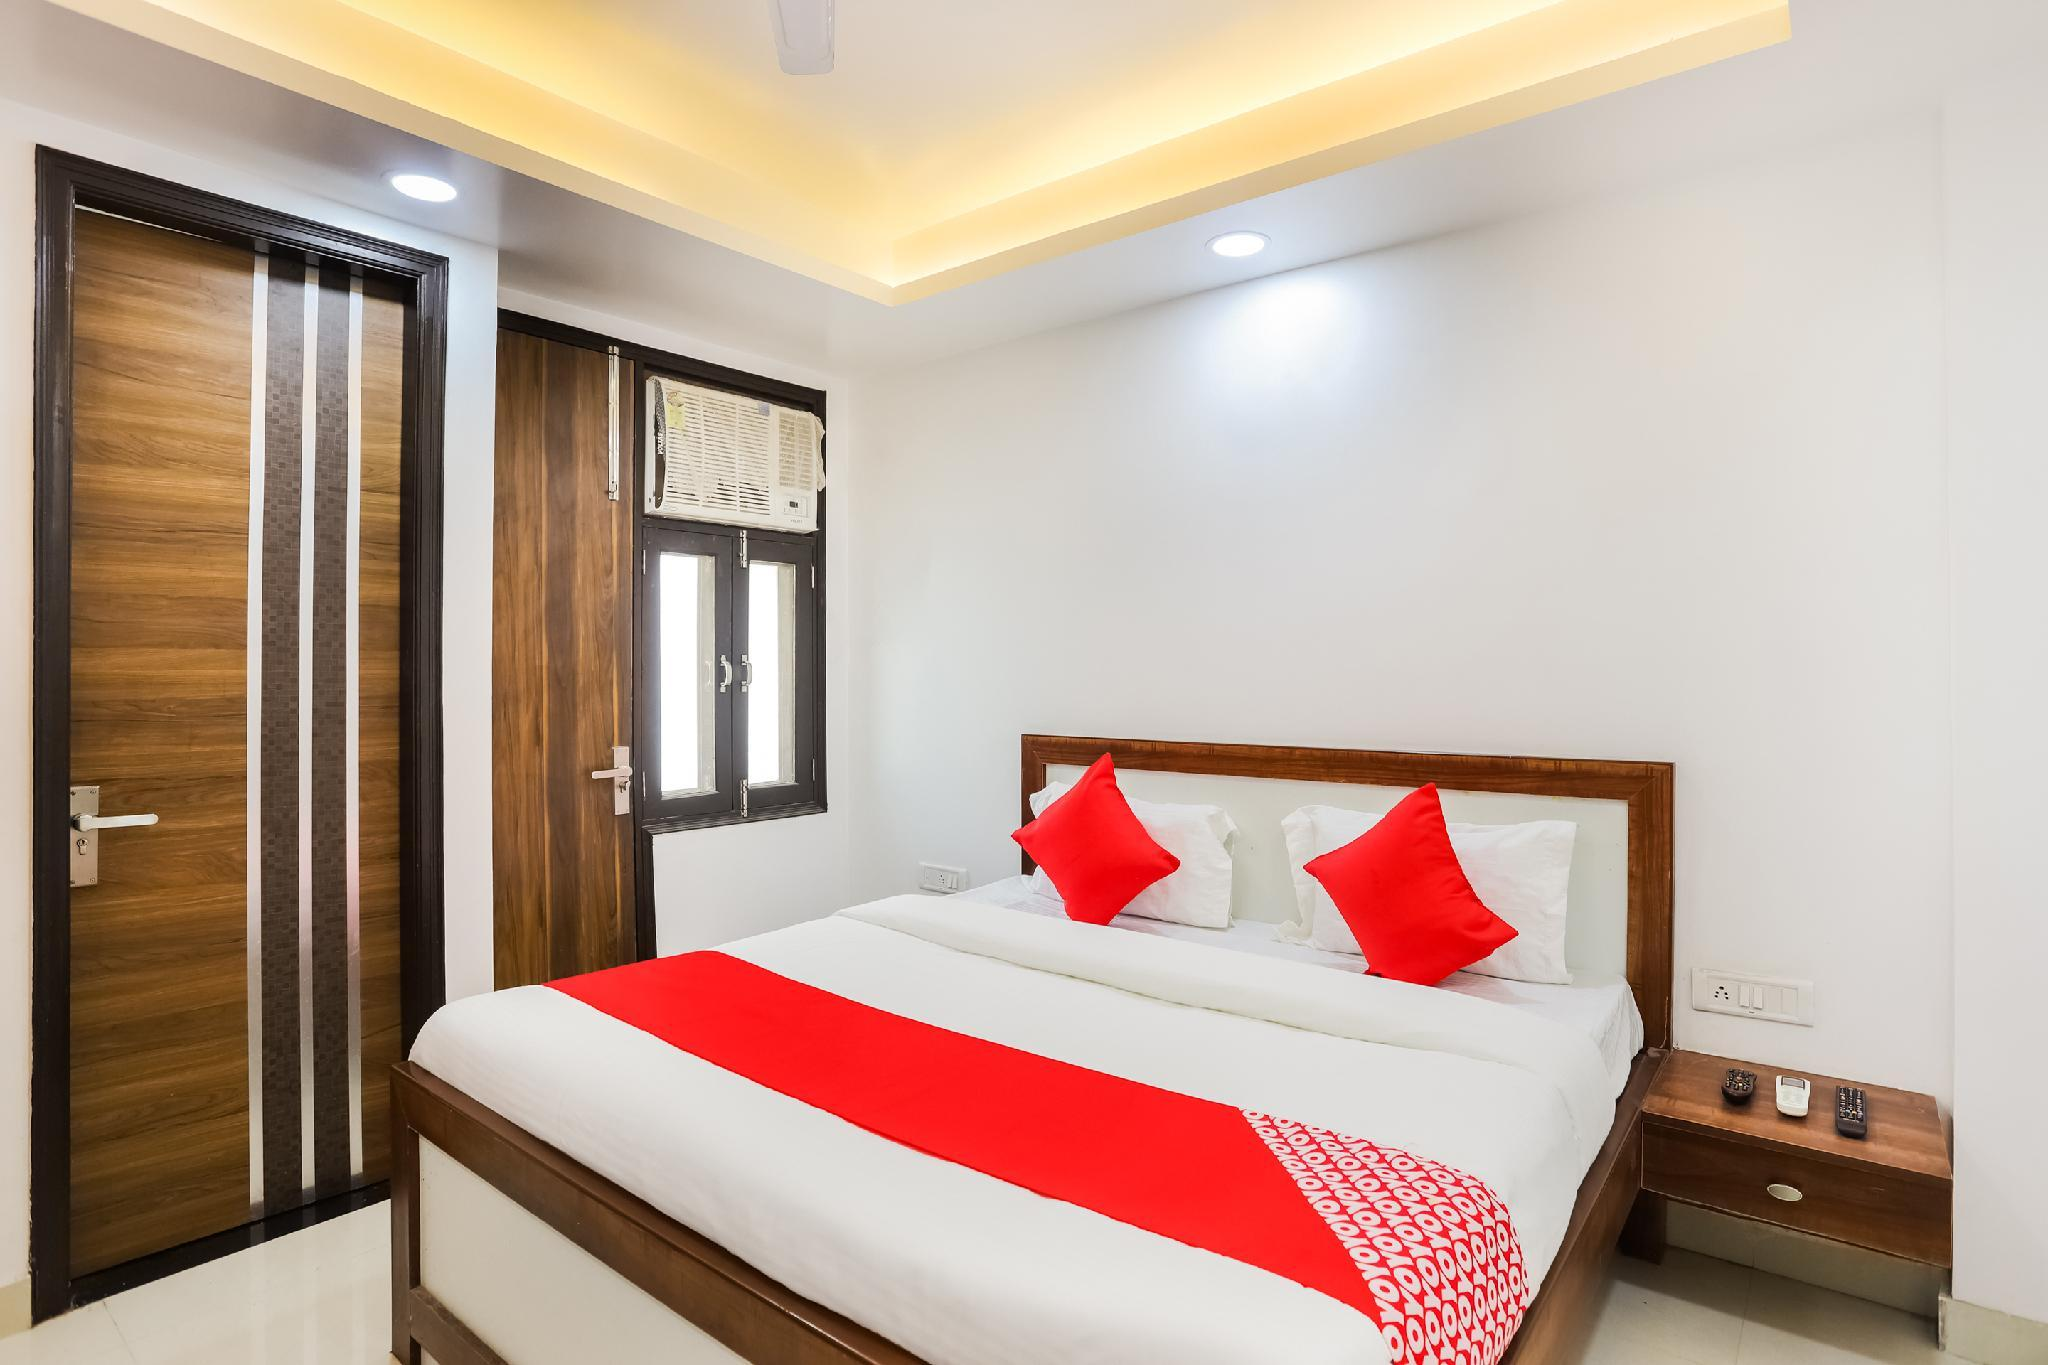 OYO 65986 Pari Residency